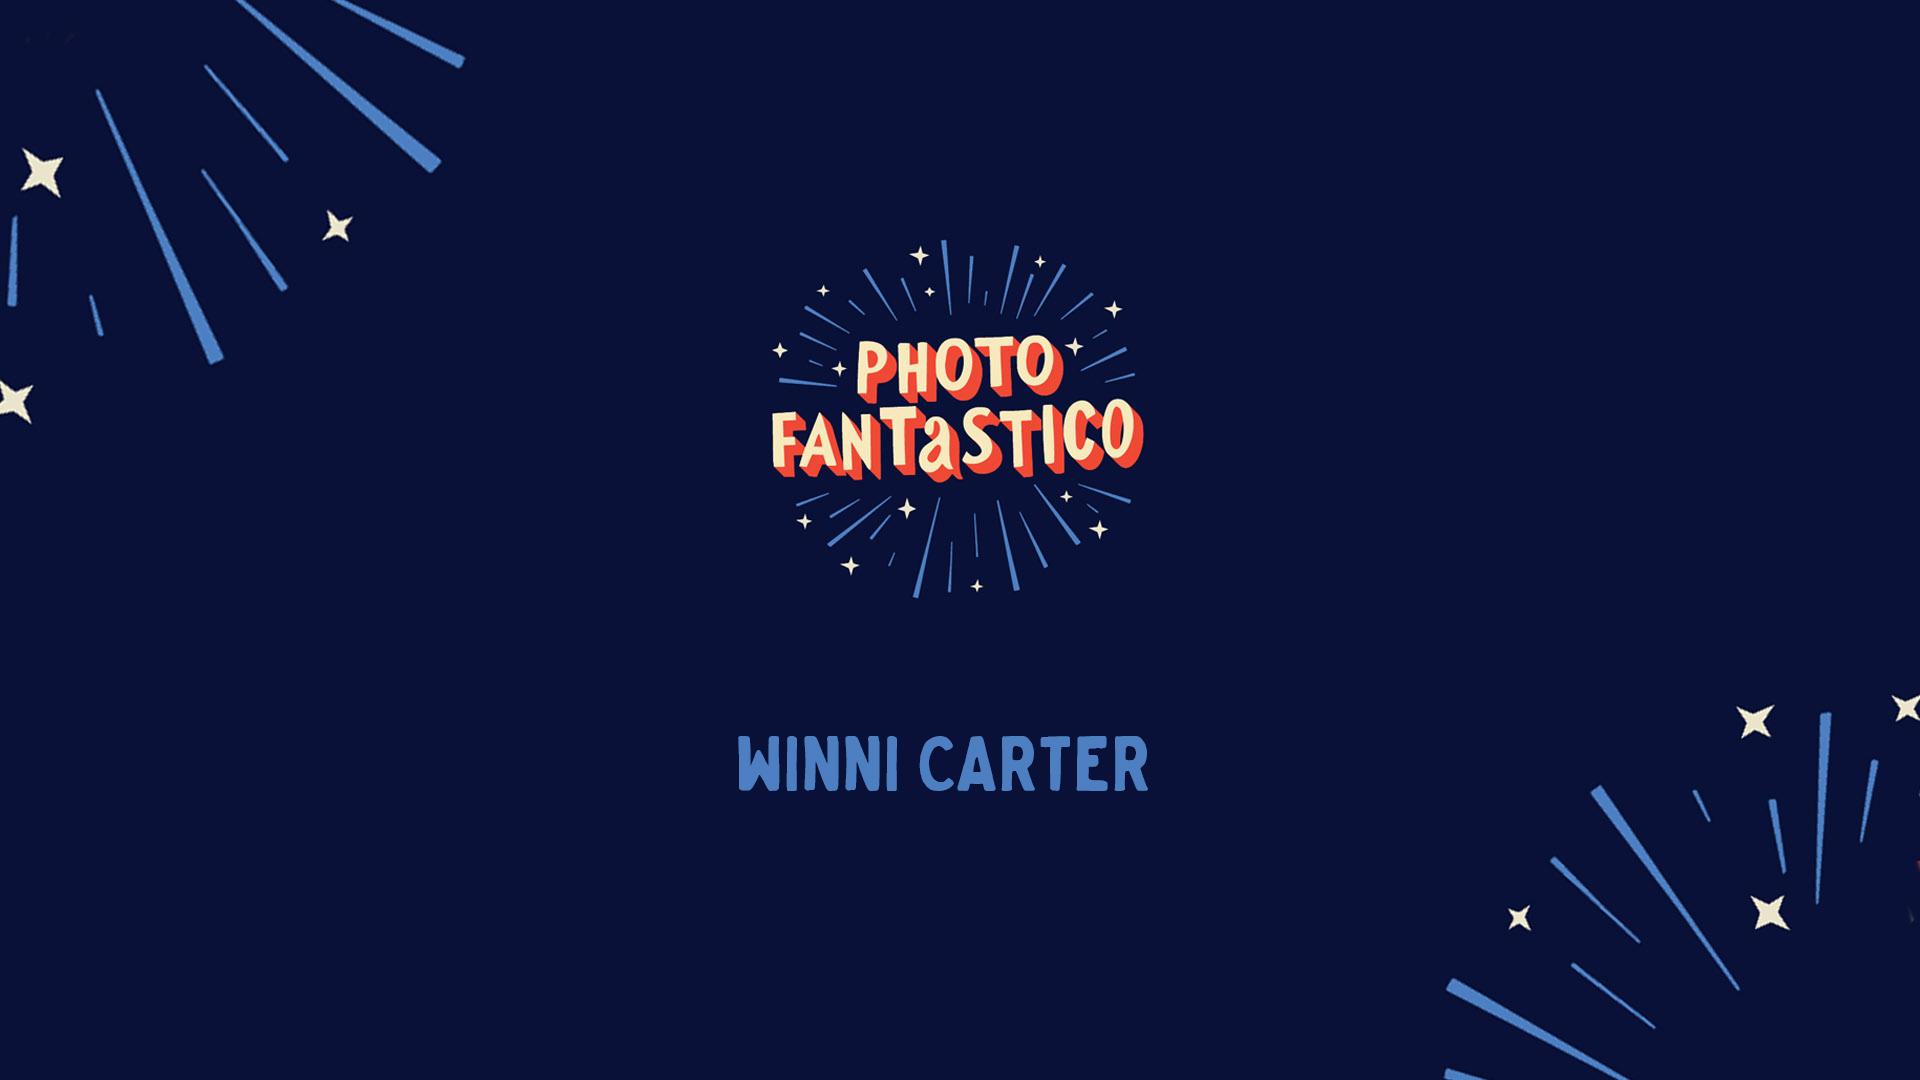 Winni Carter